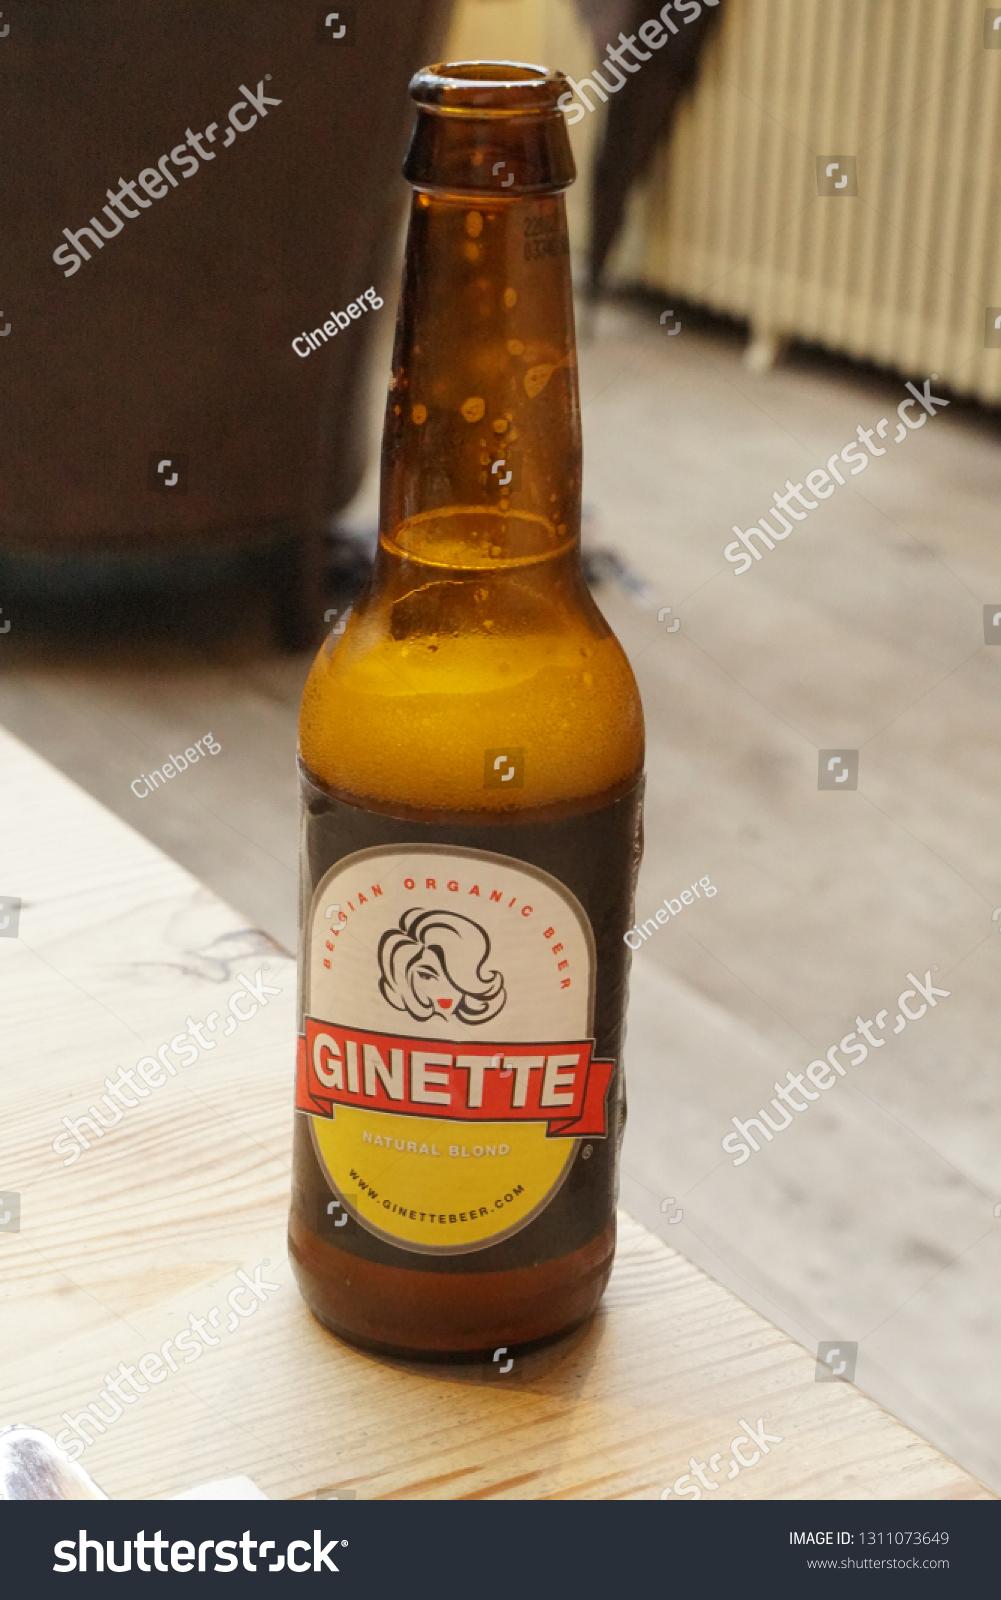 Belgian Beer Belgium Ginette Beer Watercolor Painting